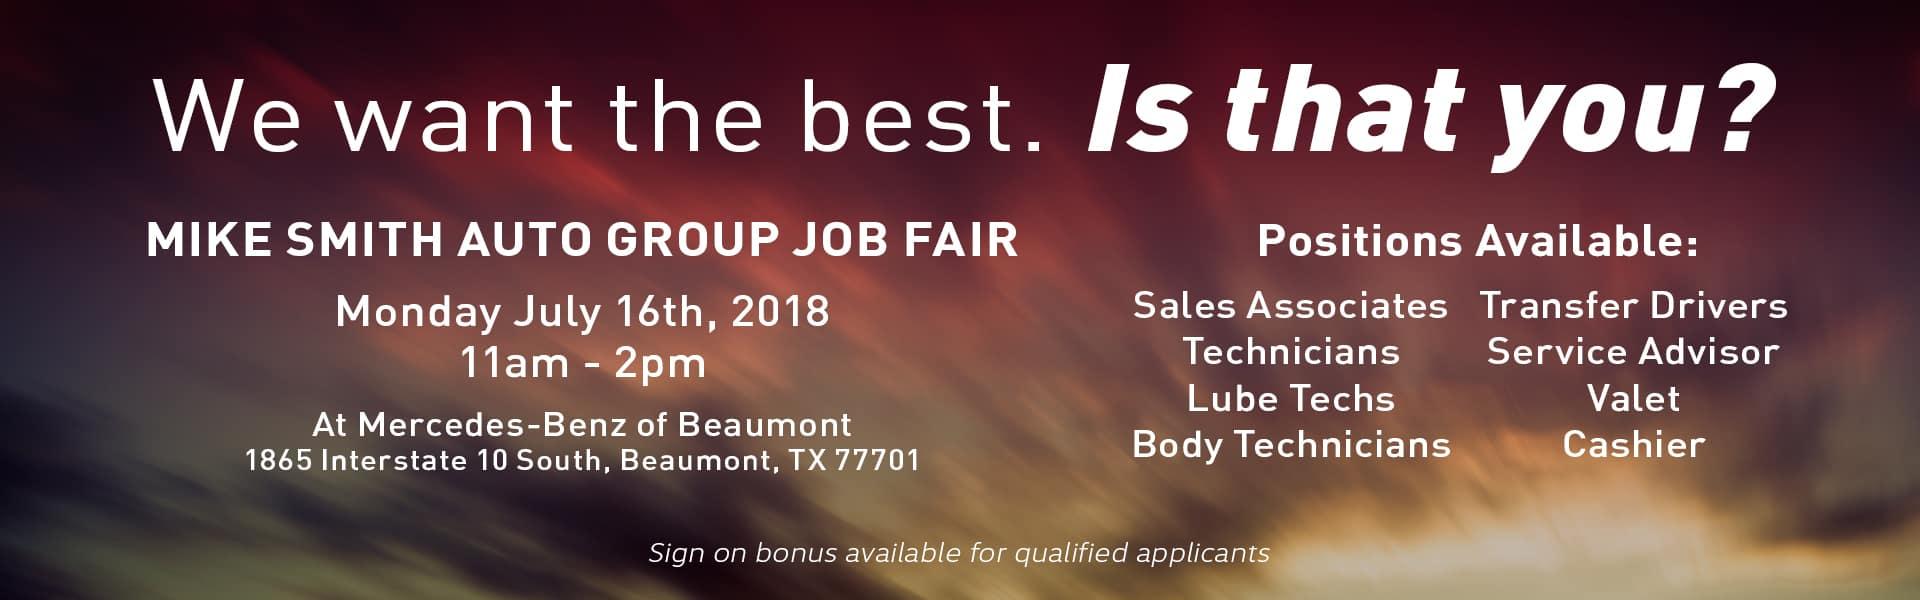 beaumont-tx-job-fair